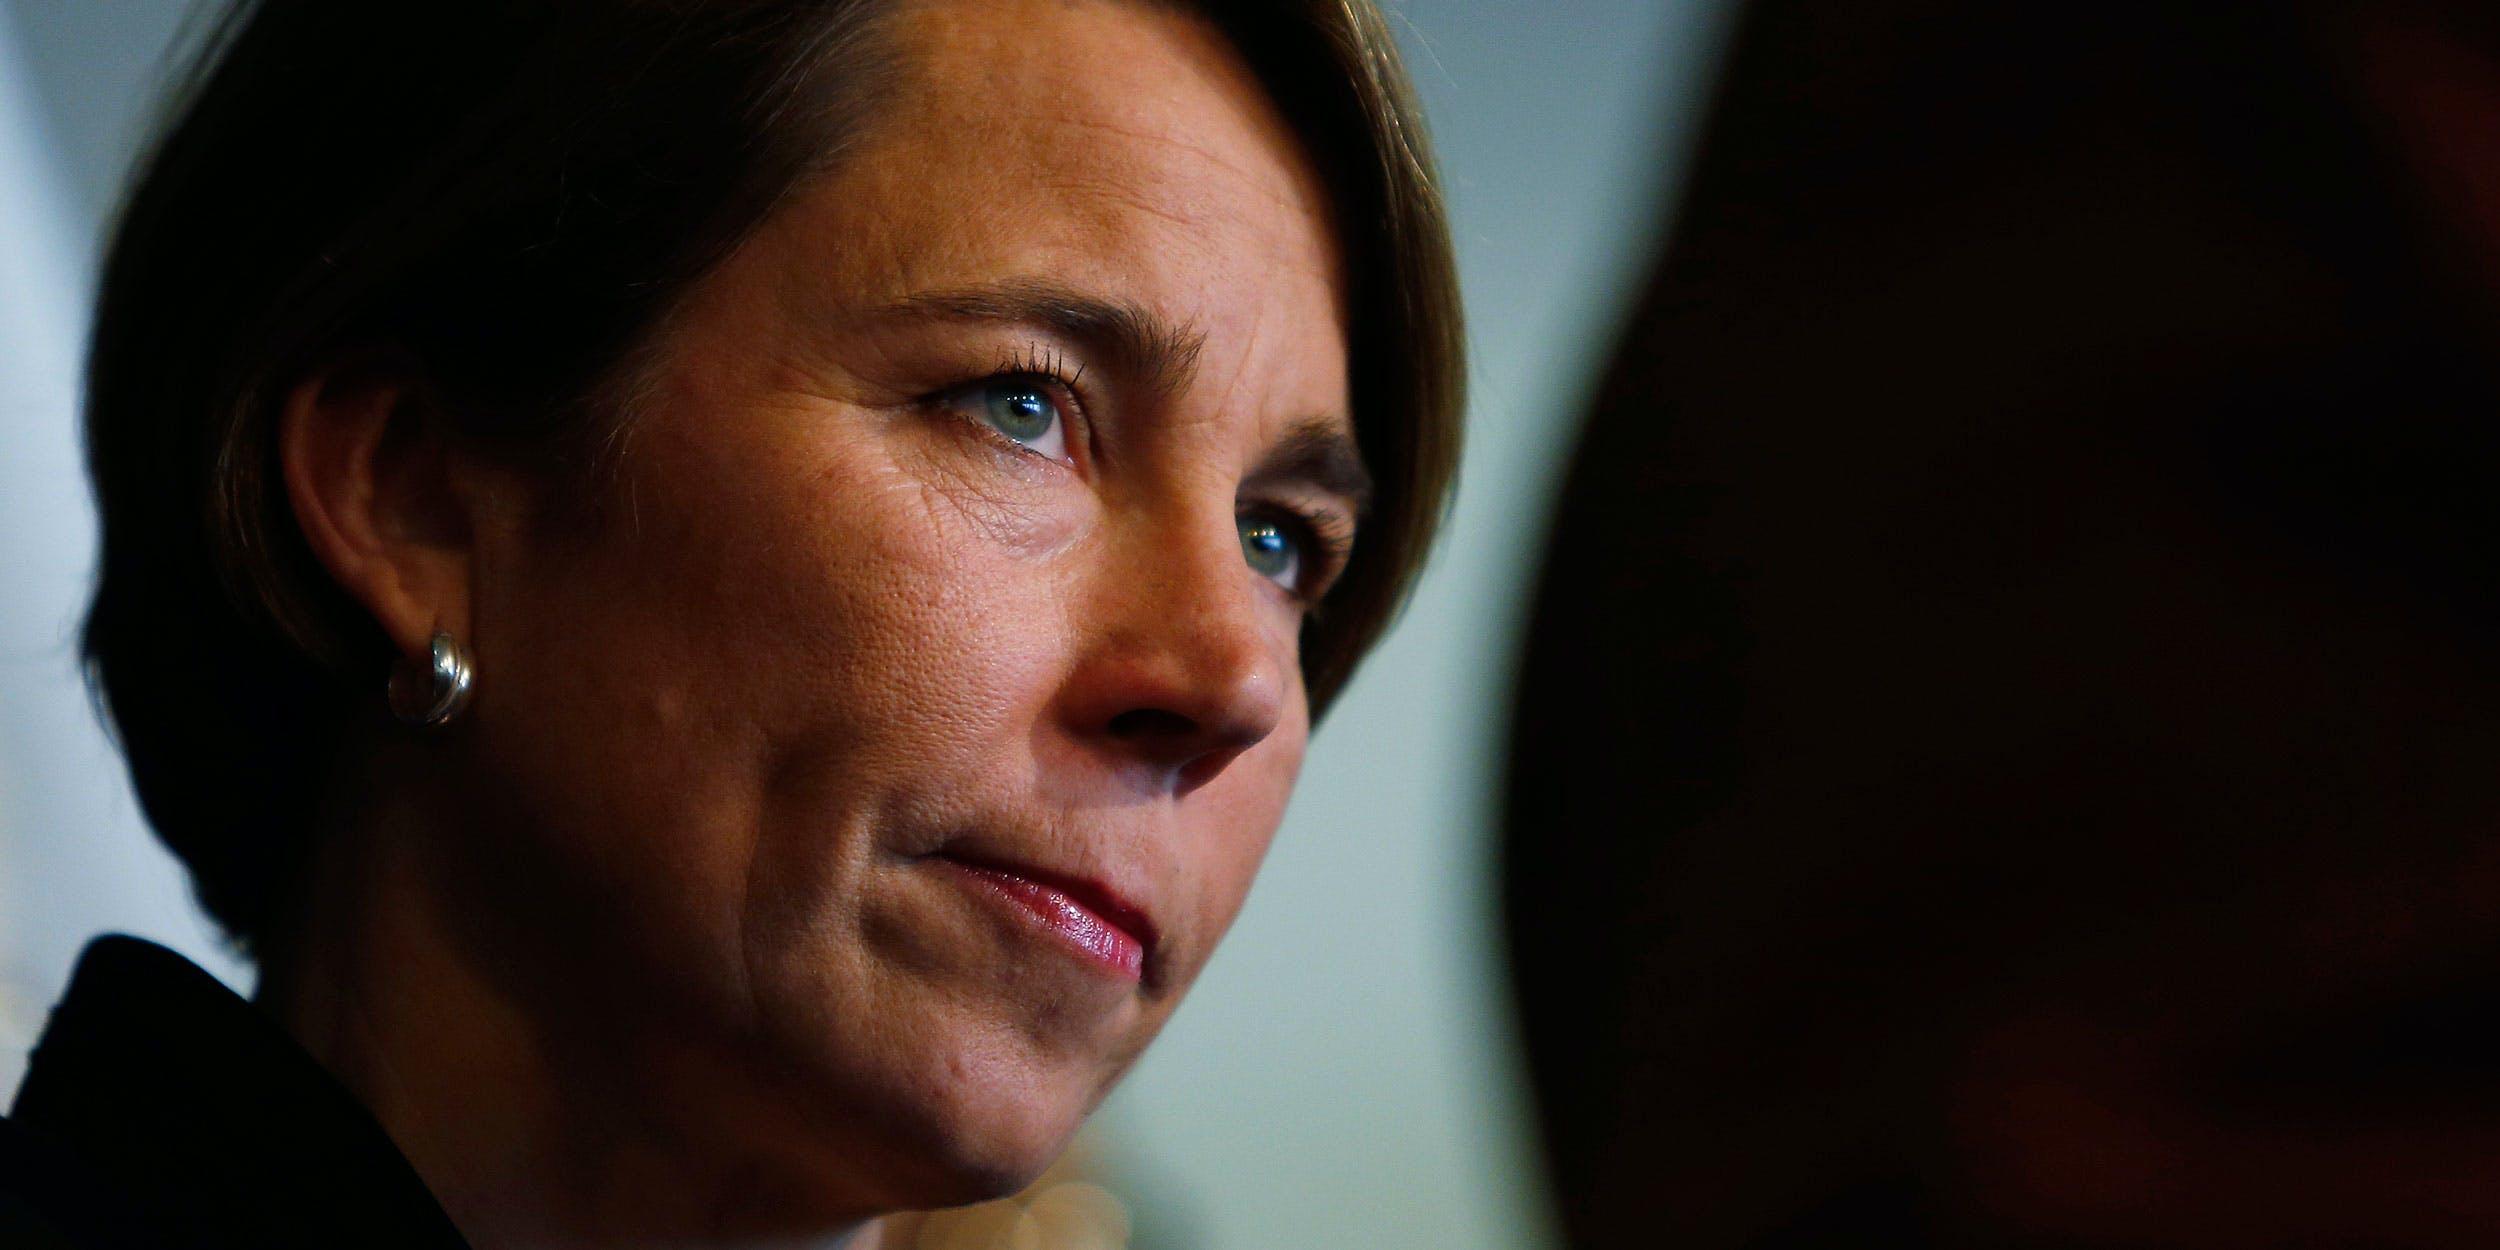 Massachusetts Attorney General Maura Healey (Photo by Jessica Rinaldi/The Boston Globe via Getty Images)